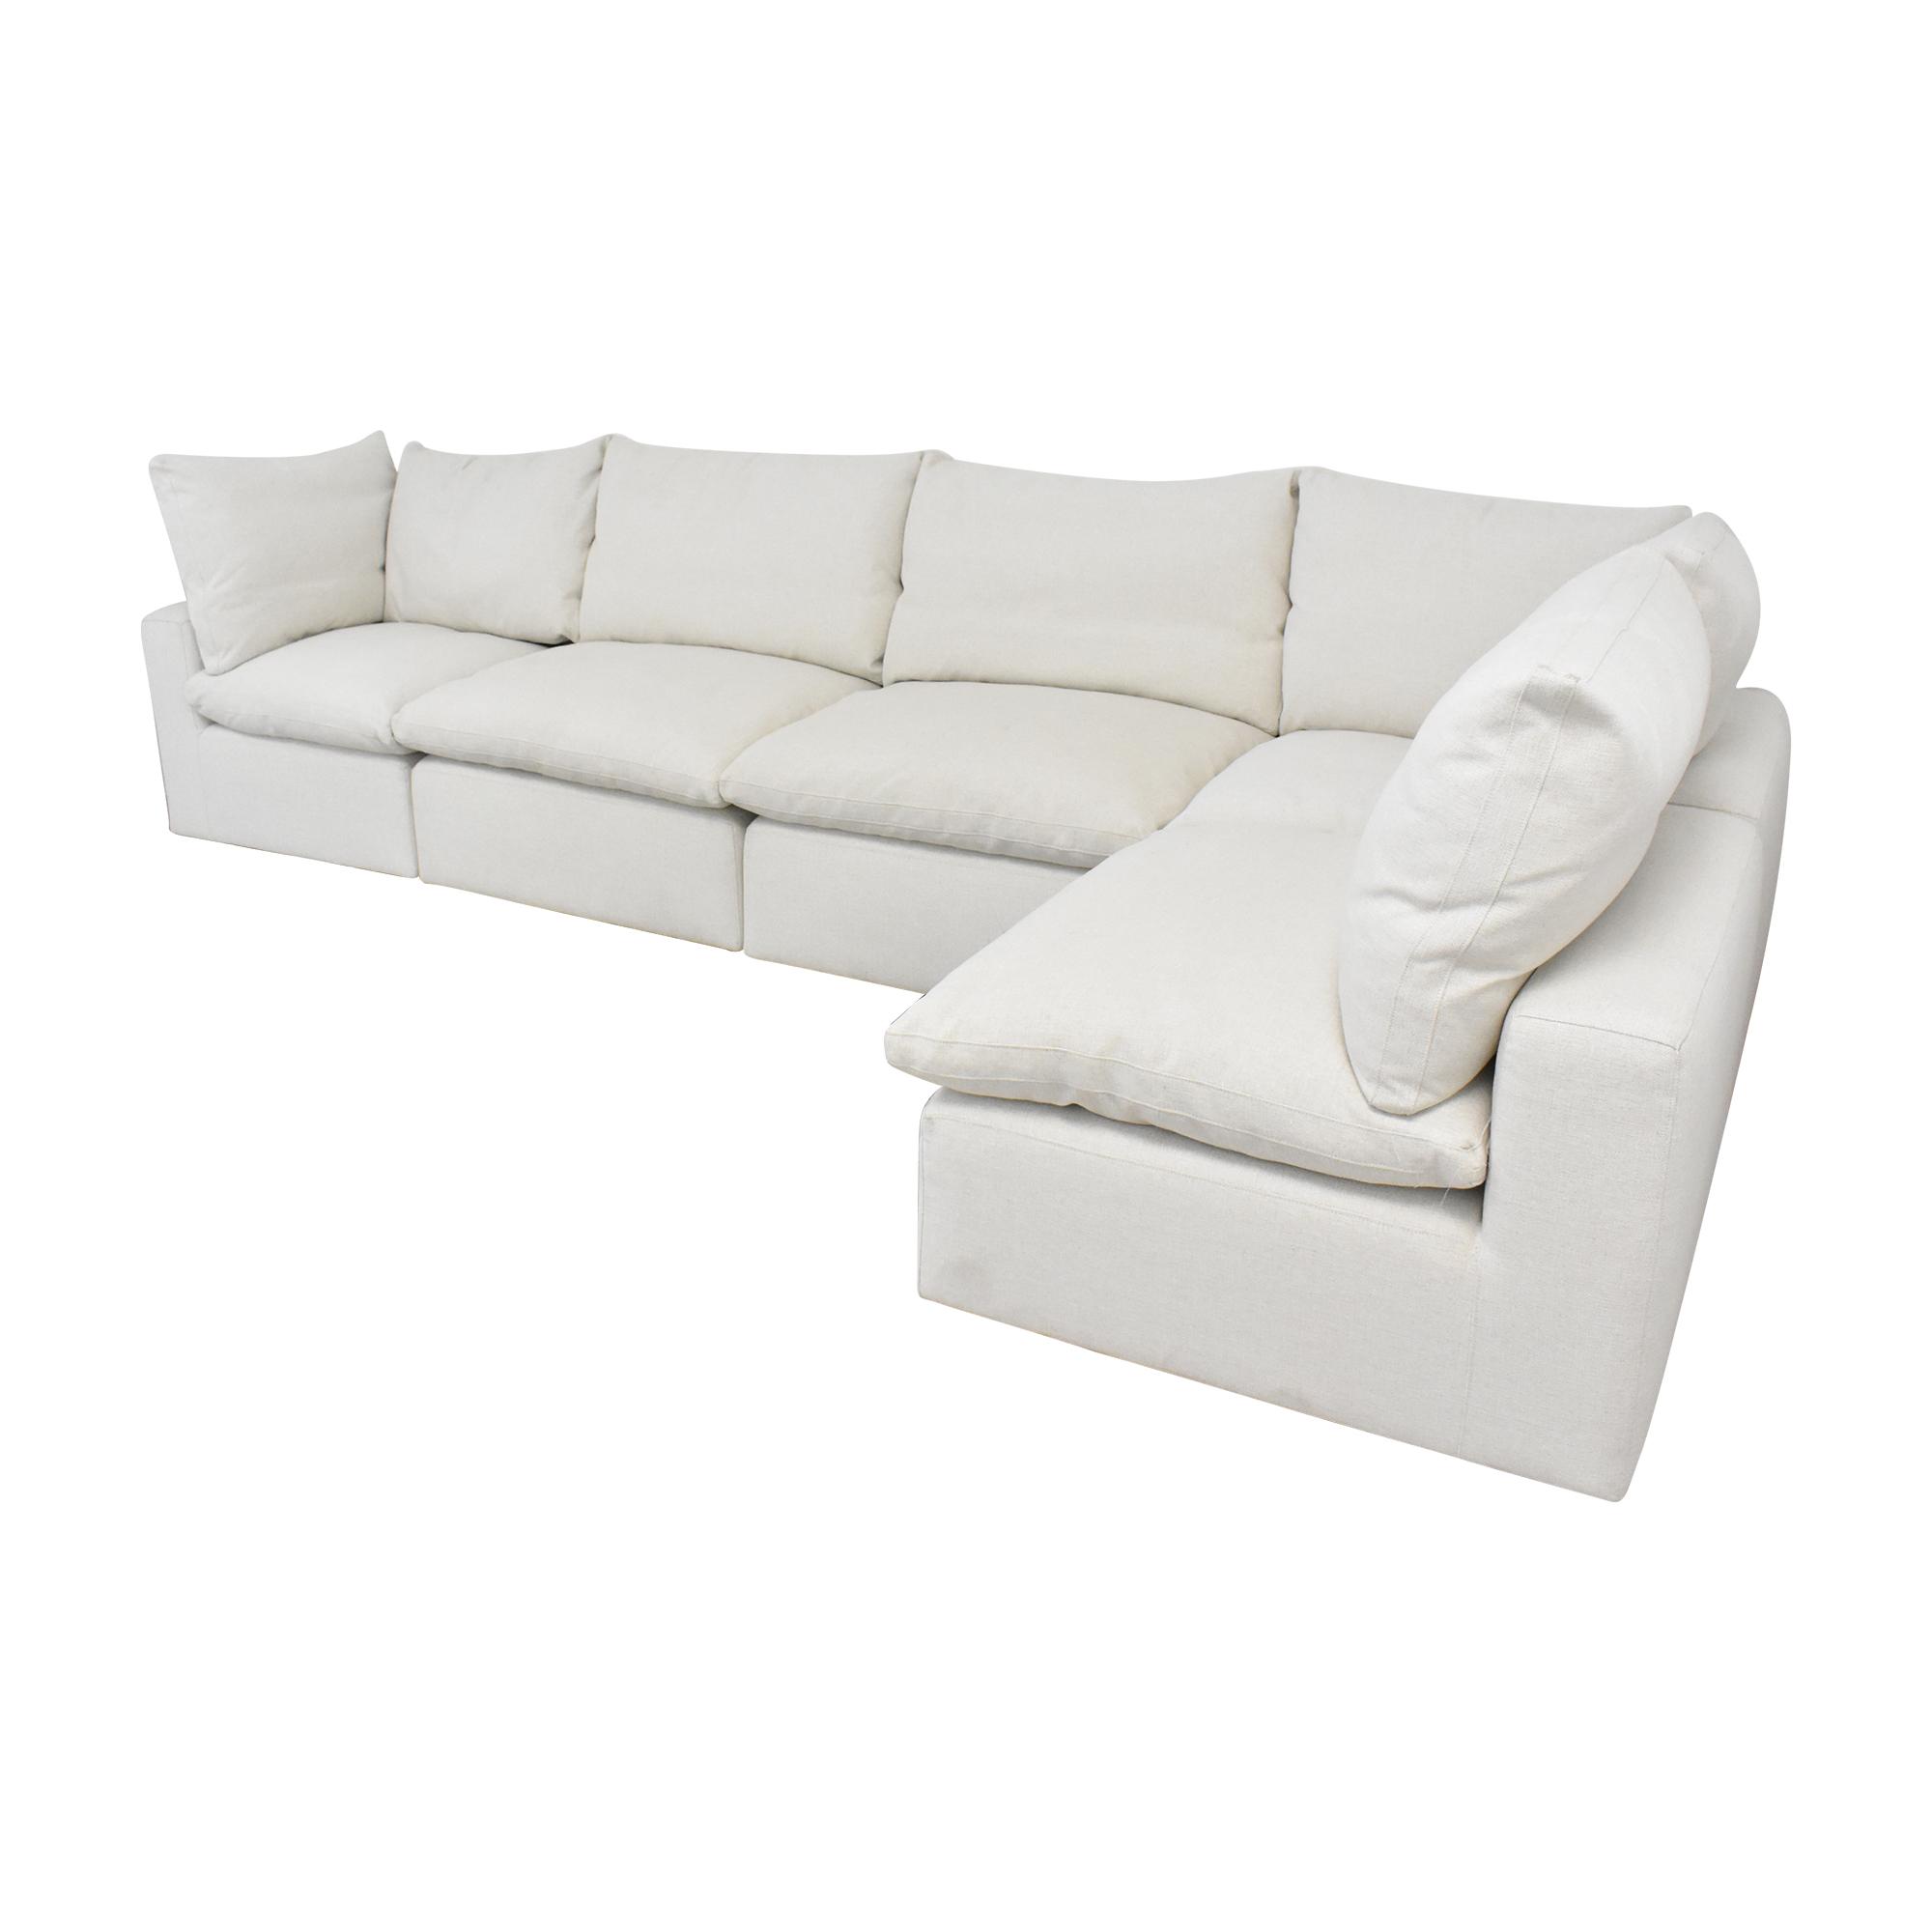 shop Bassett Furniture Bassett Furniture Corner Modular Sofa online